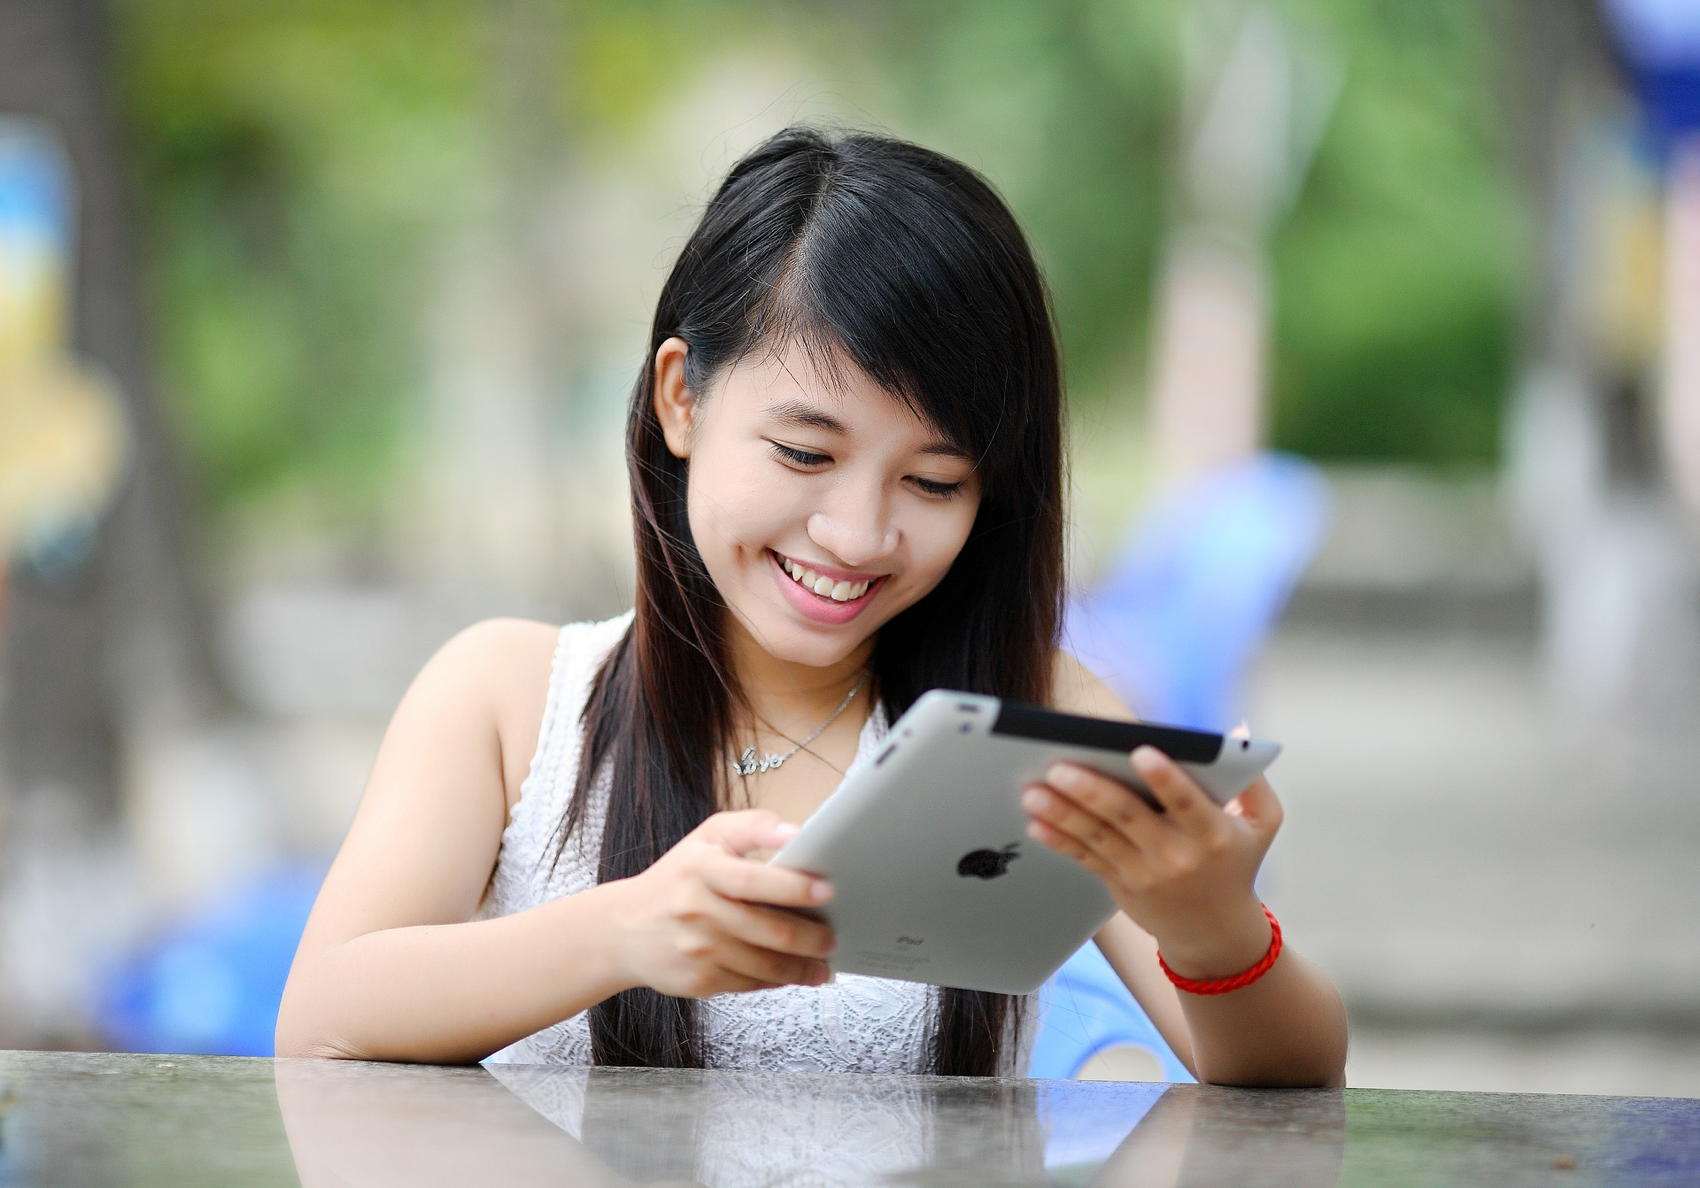 Girl Using iPad - Image by Jess Foami